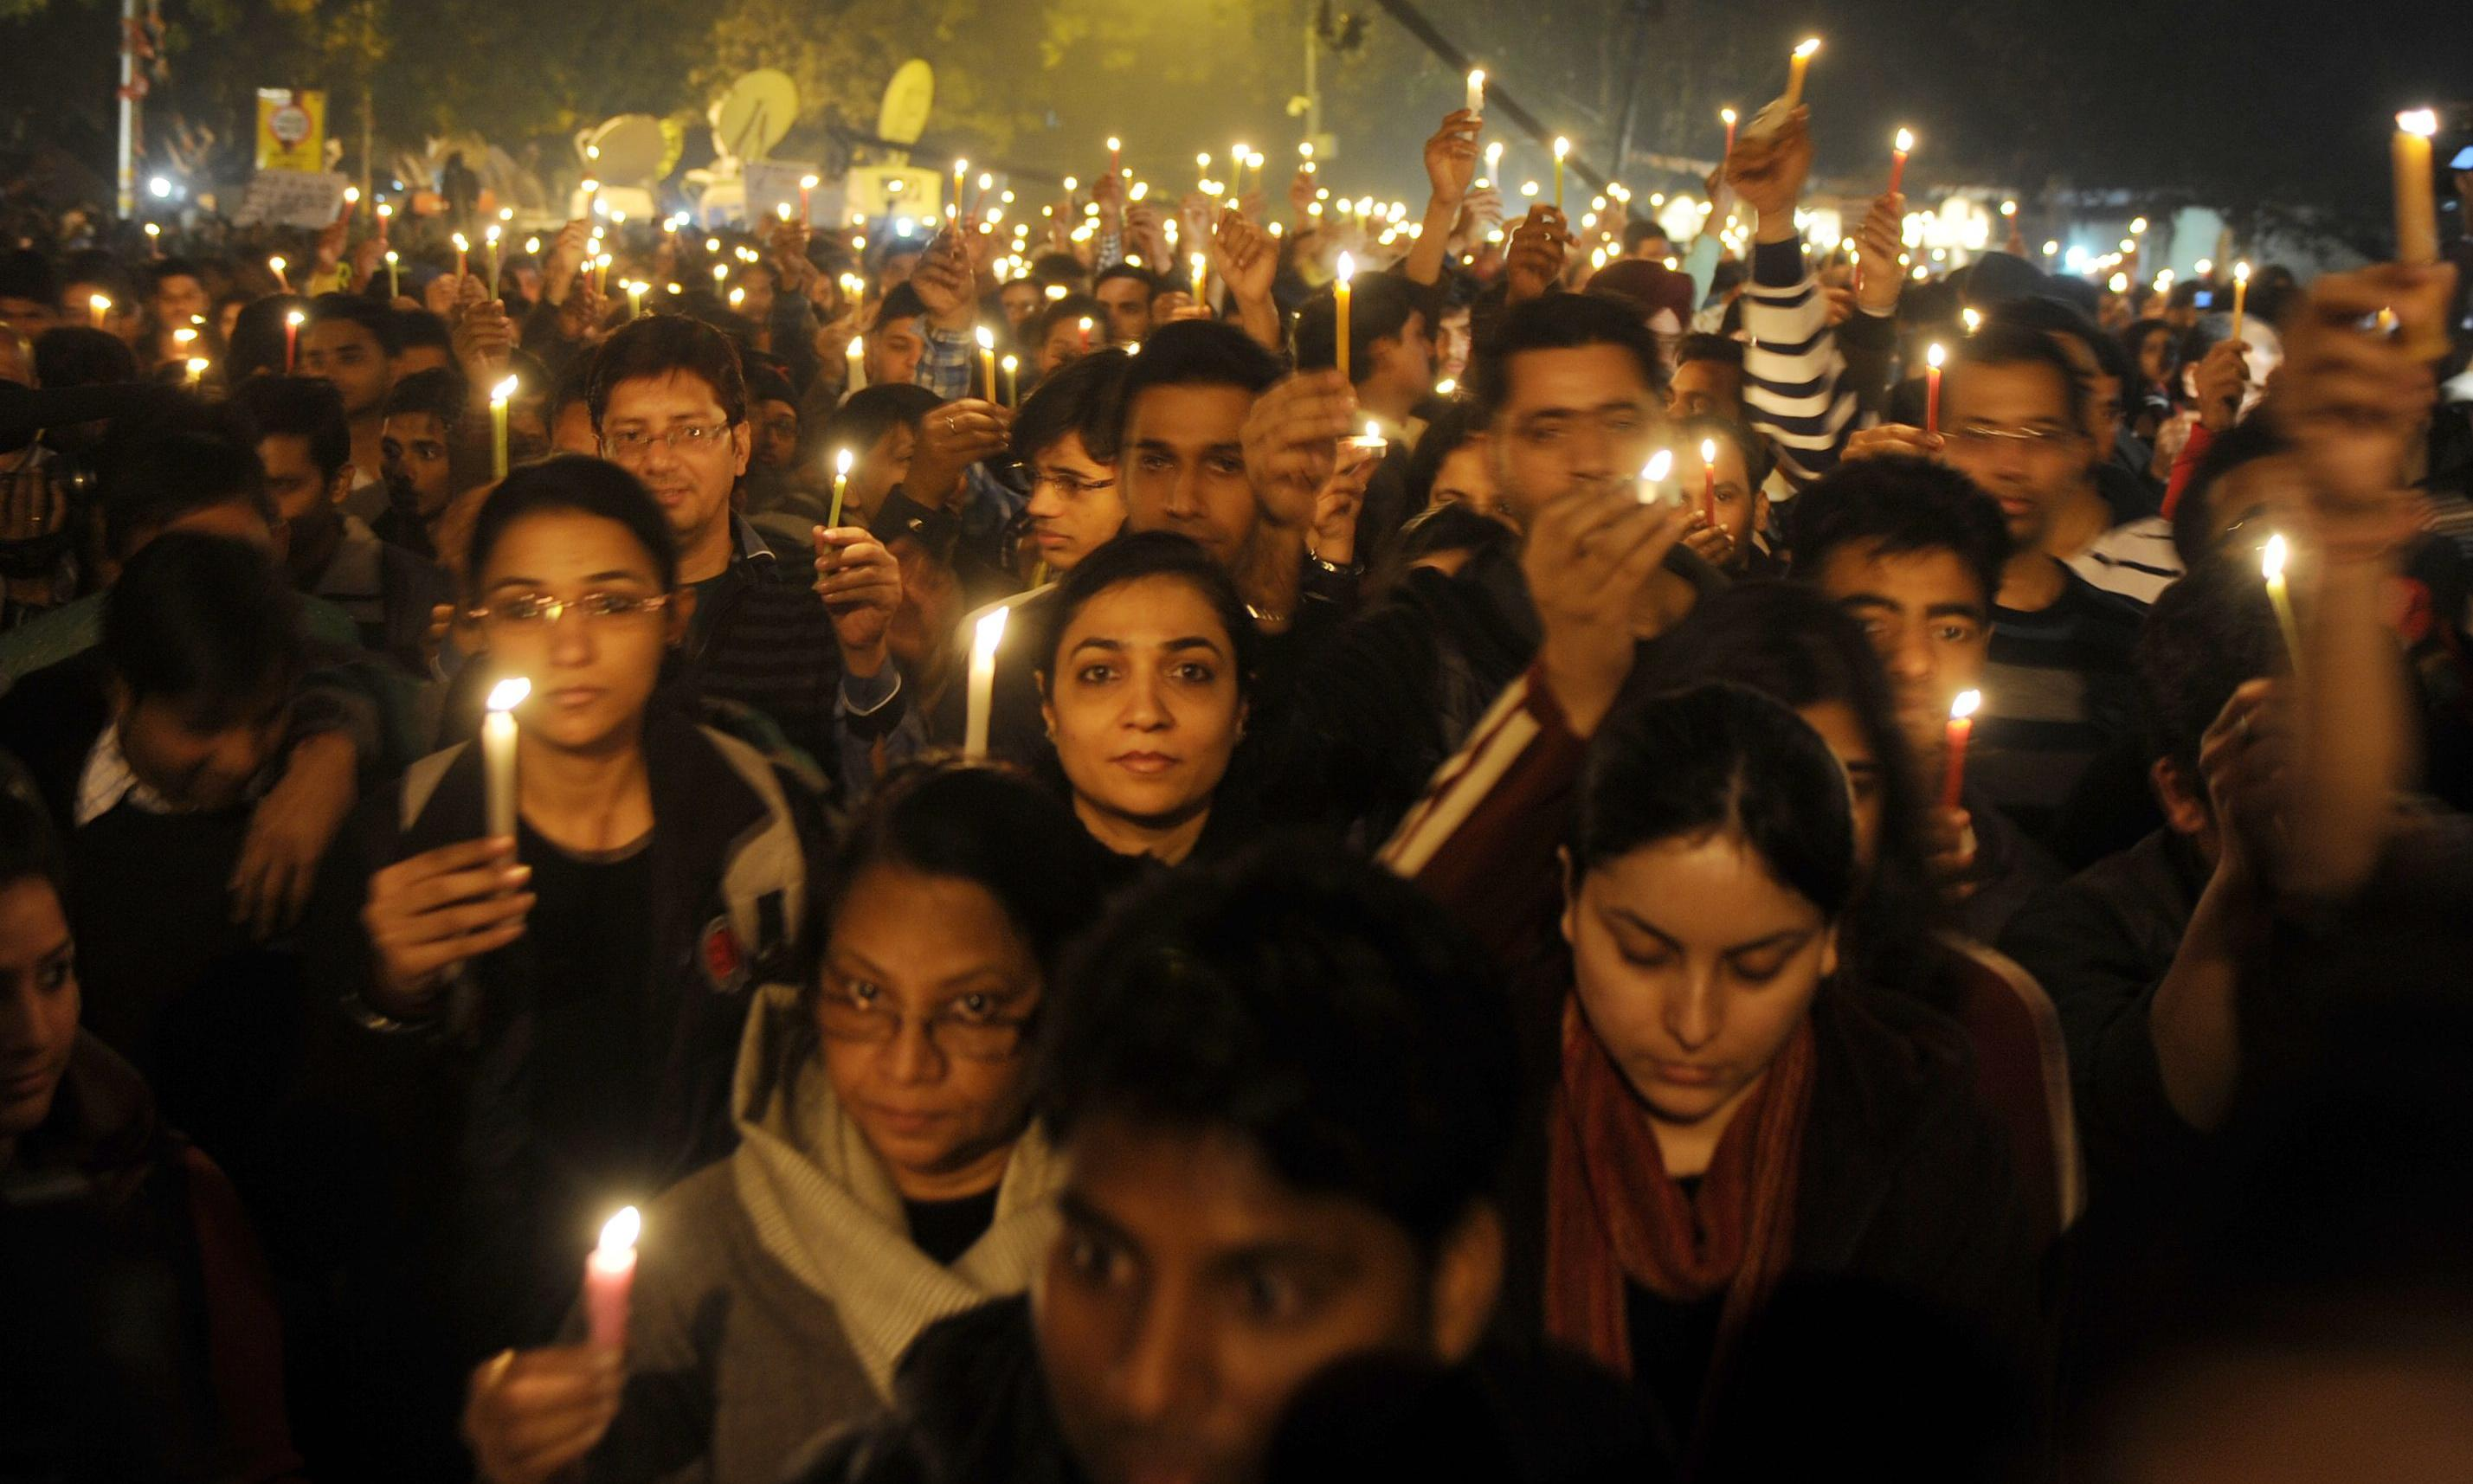 Delhi Crime: Netflix drama takes on gang rape that shocked India